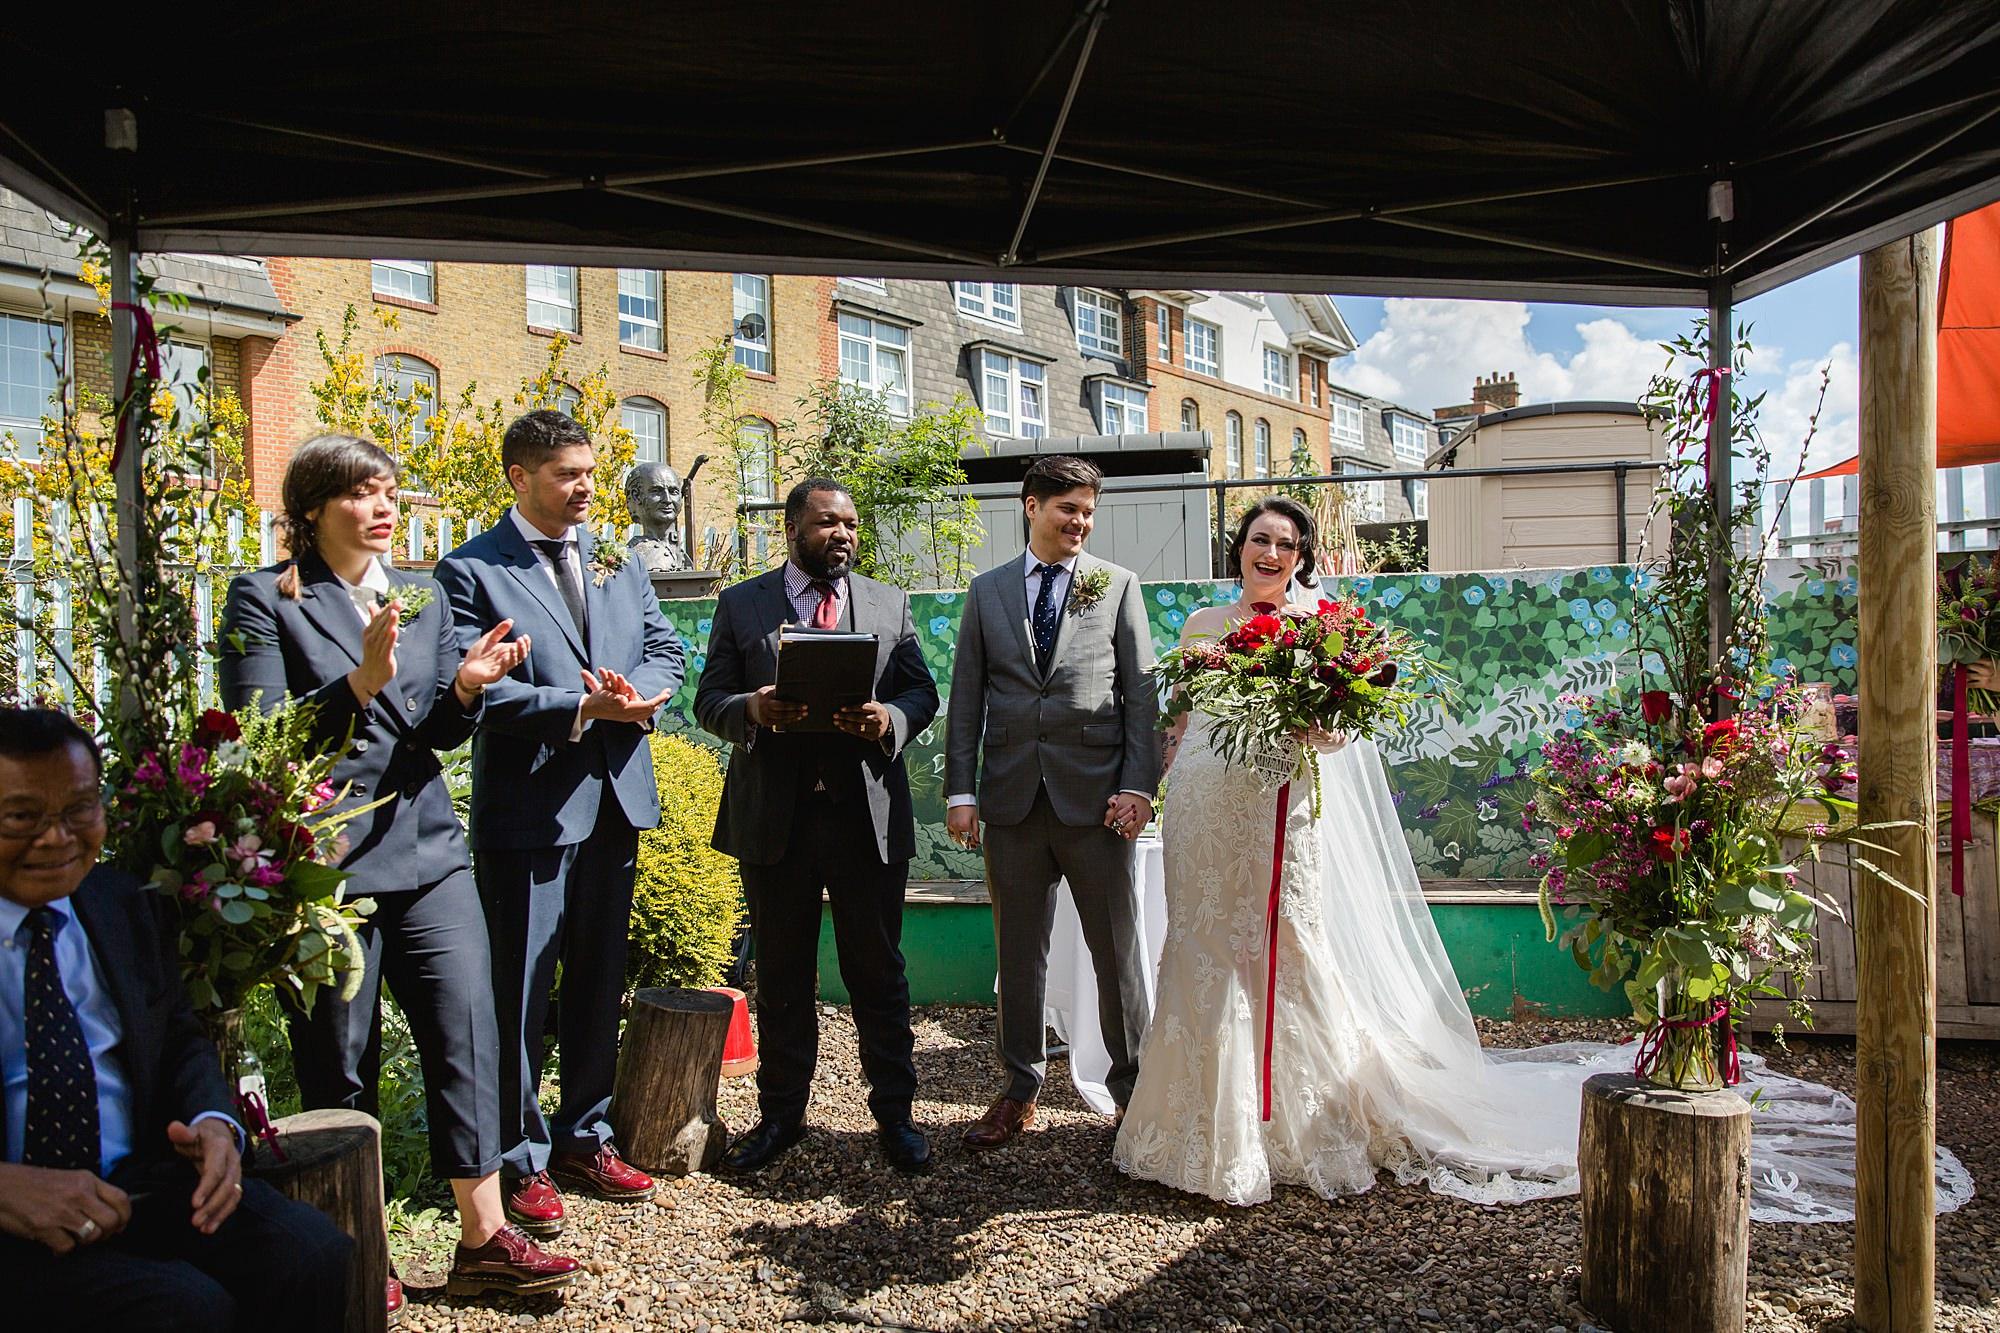 Brunel museum wedding bride and groom after wedding ceremony